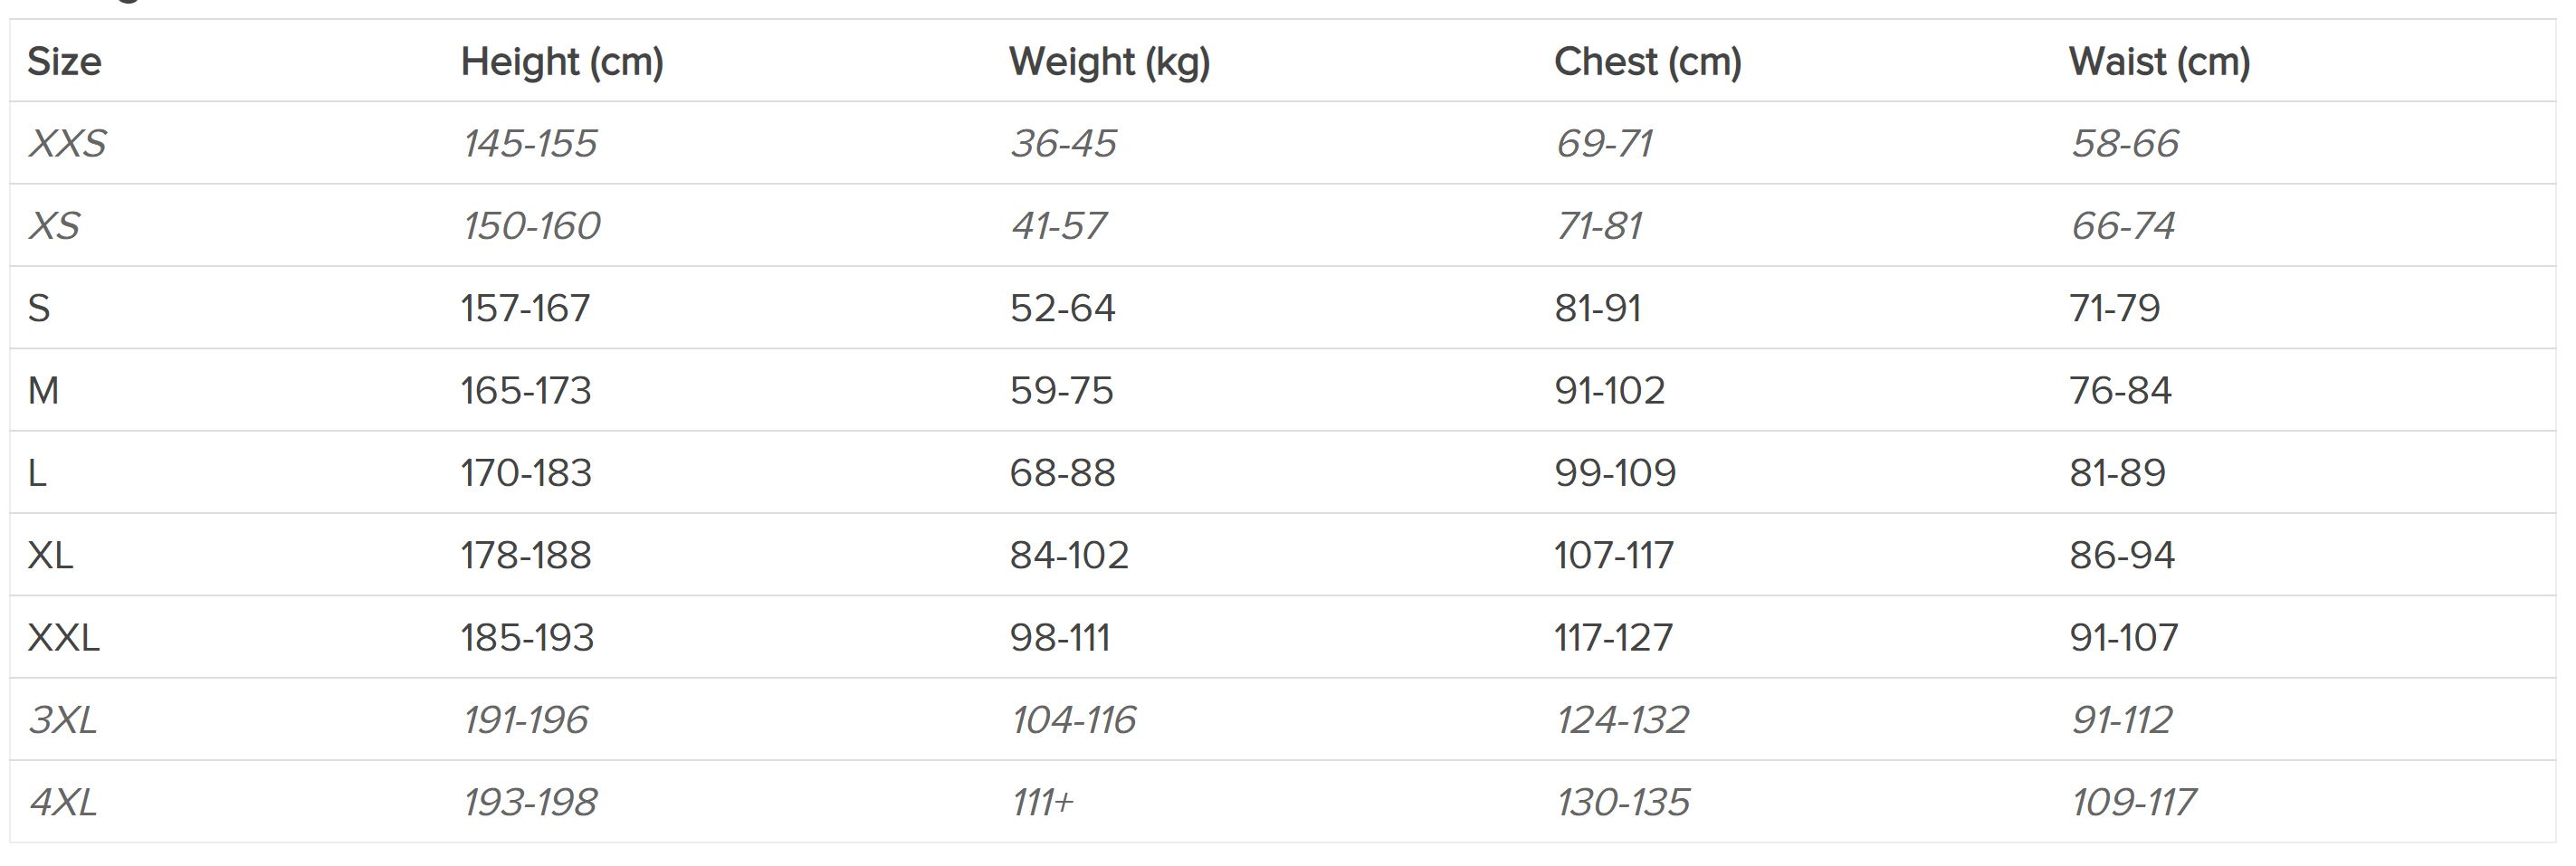 nrs-mens-size-chart.jpg